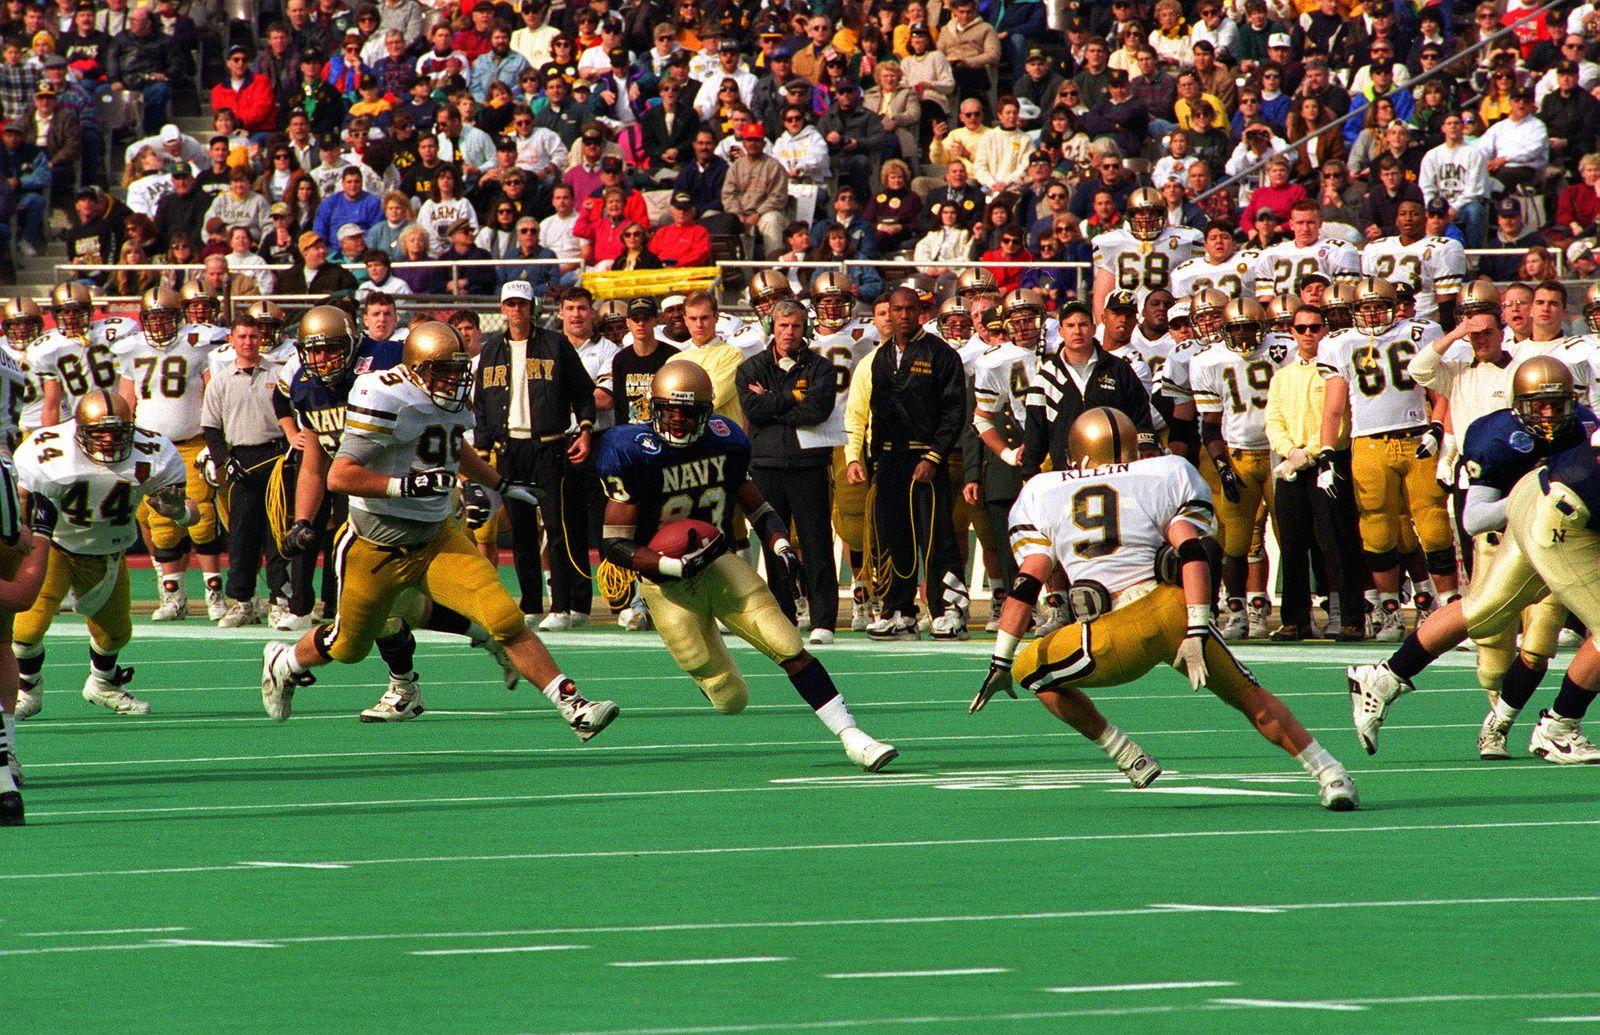 A U S Naval Academy Football Player Advances The Ball Forward During The Annual Army Navy Football Gam Army Navy Football Naval Academy Football Navy Football